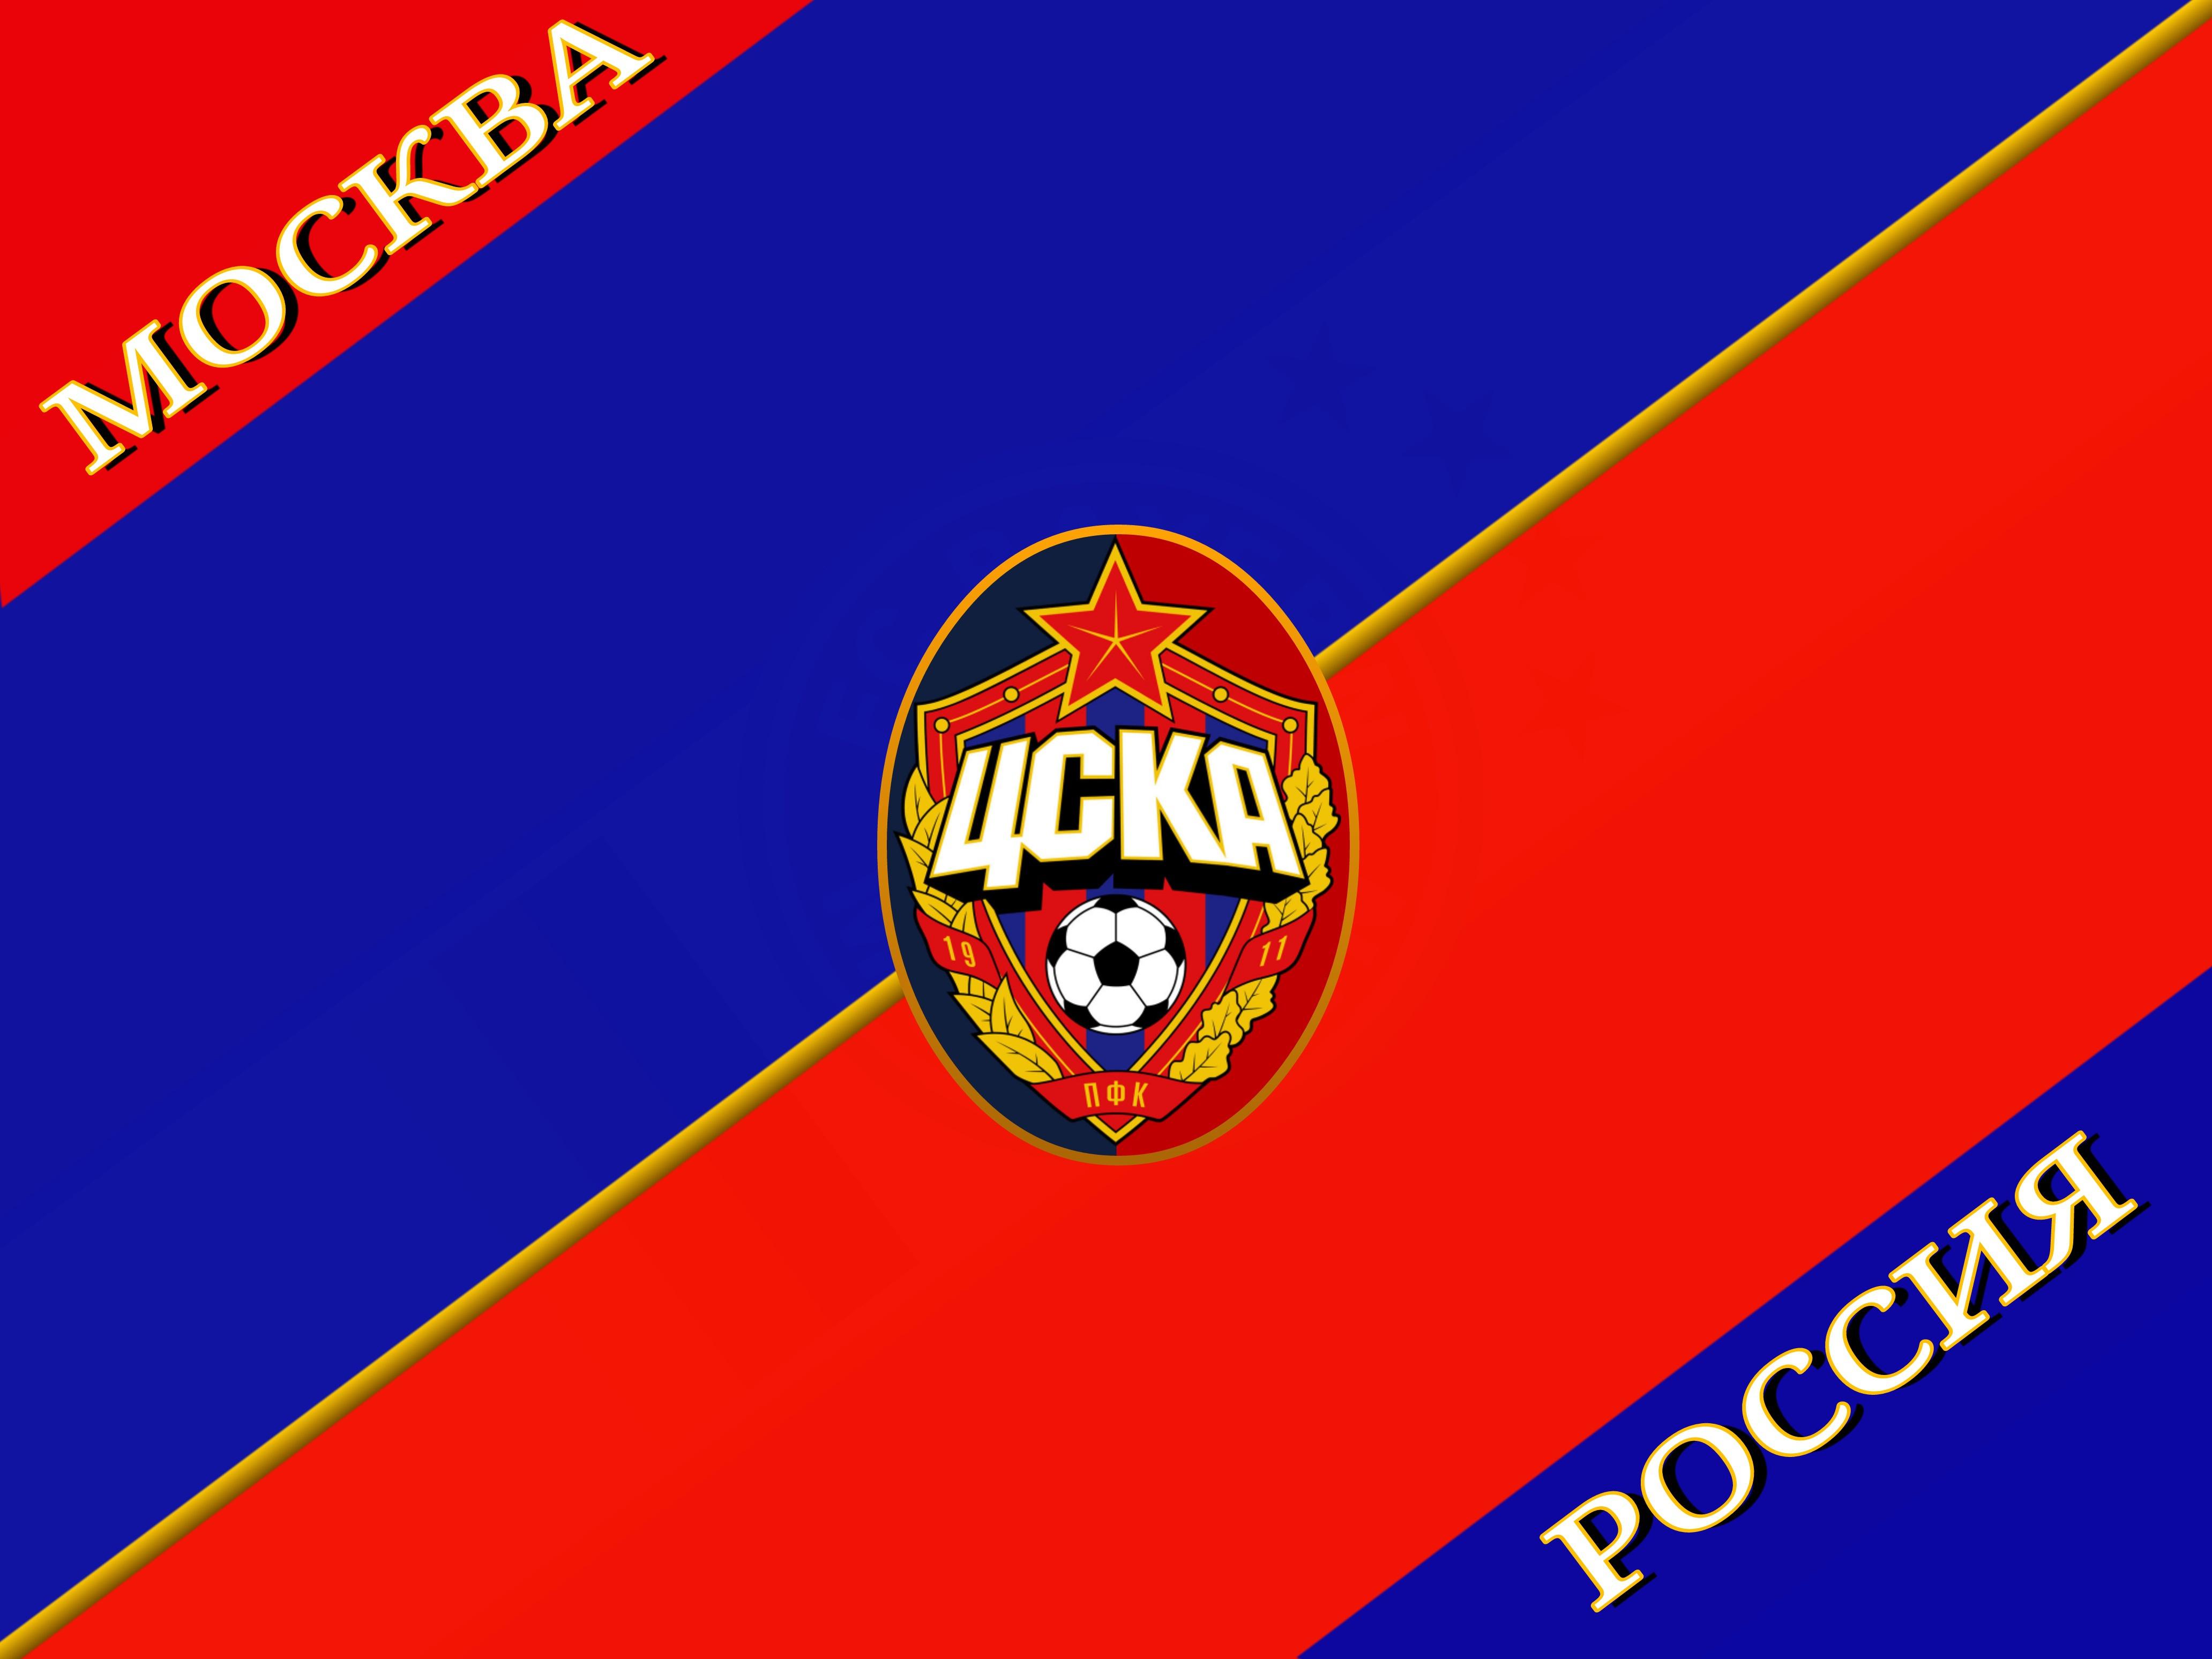 PFC CSKA Moscow 4k Ultra HD Wallpaper Background Image 4128x3096